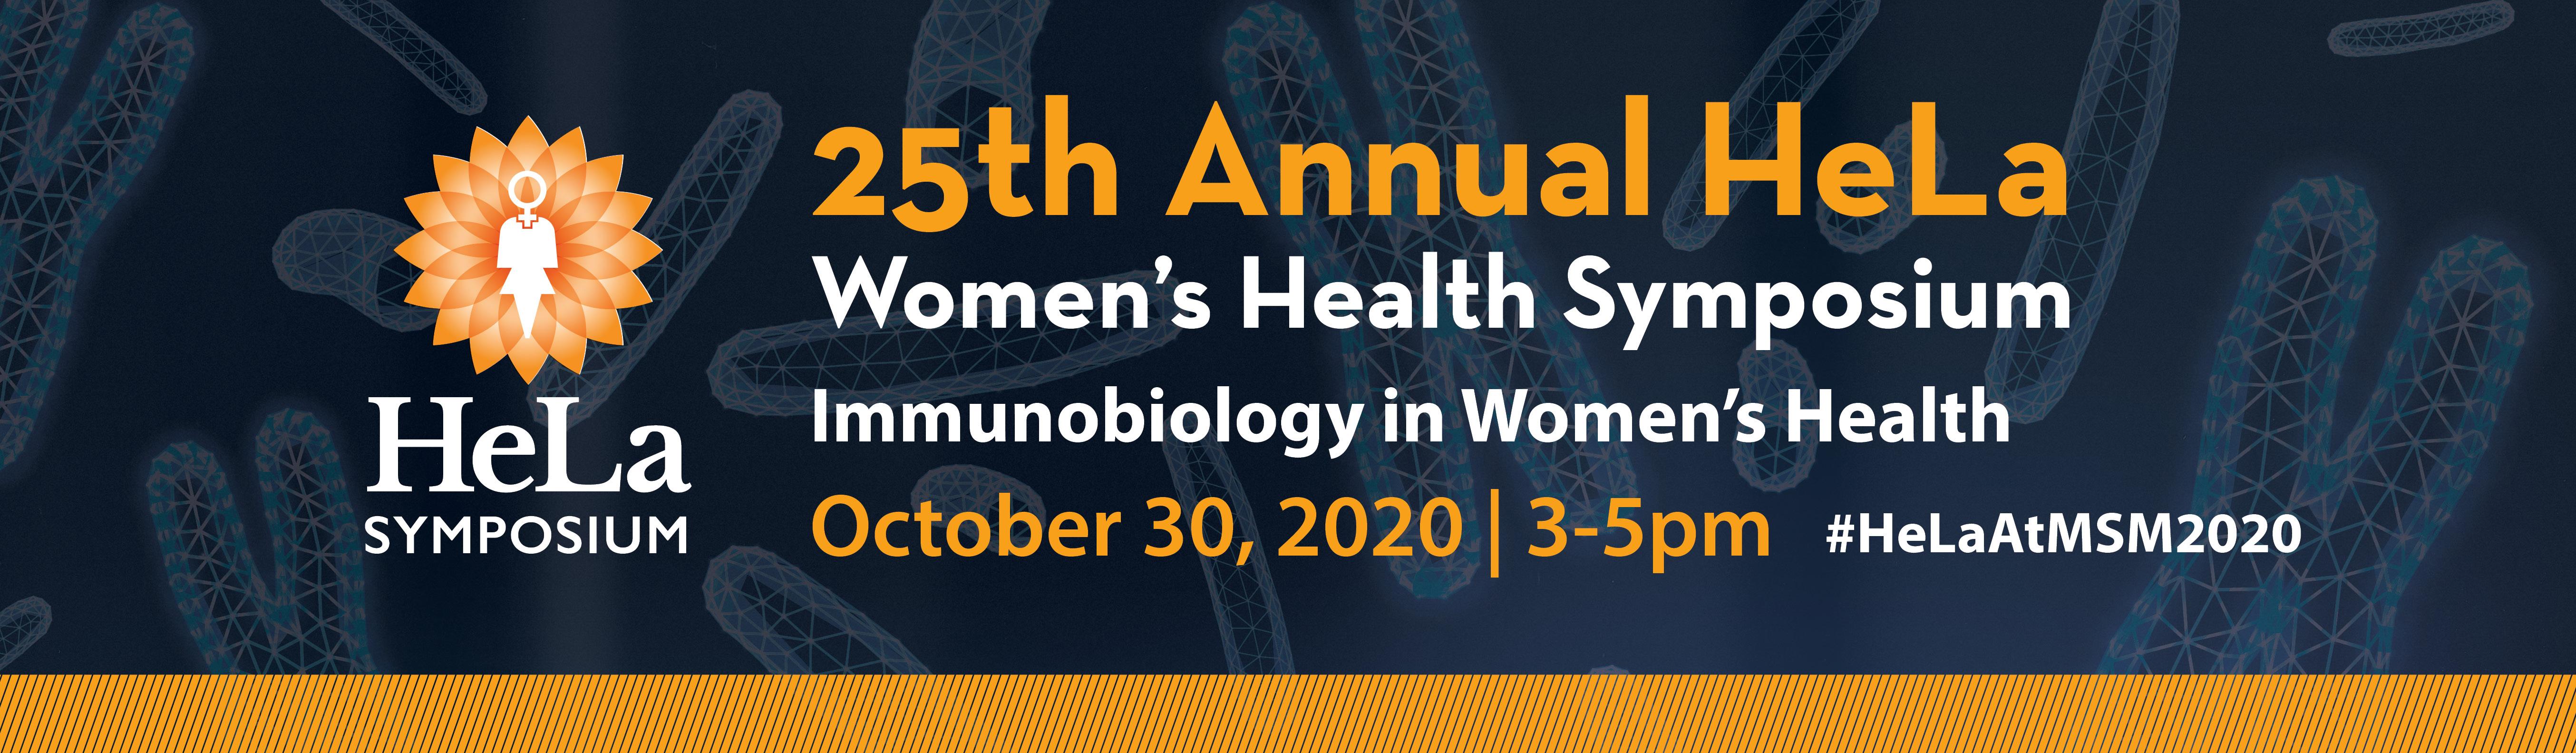 25th Annual HeLa Women's Health Symposium